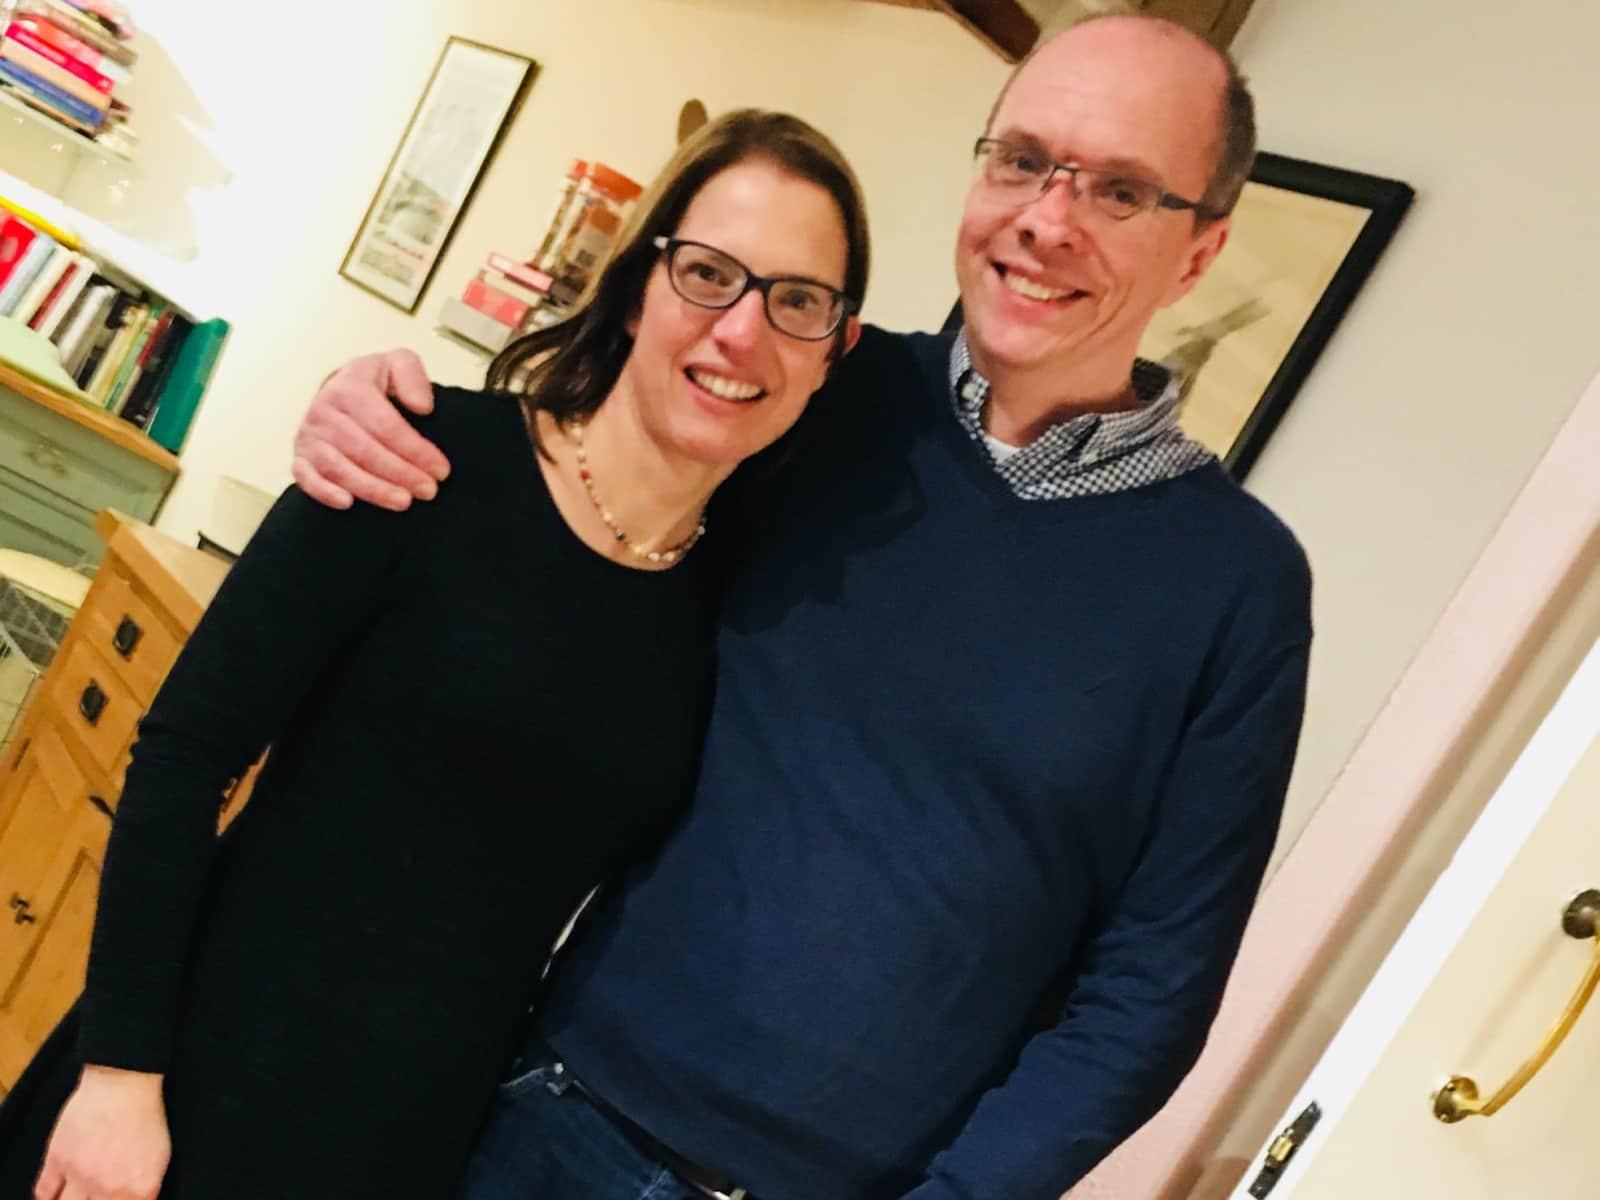 Danya & Stephen from Malmesbury, United Kingdom